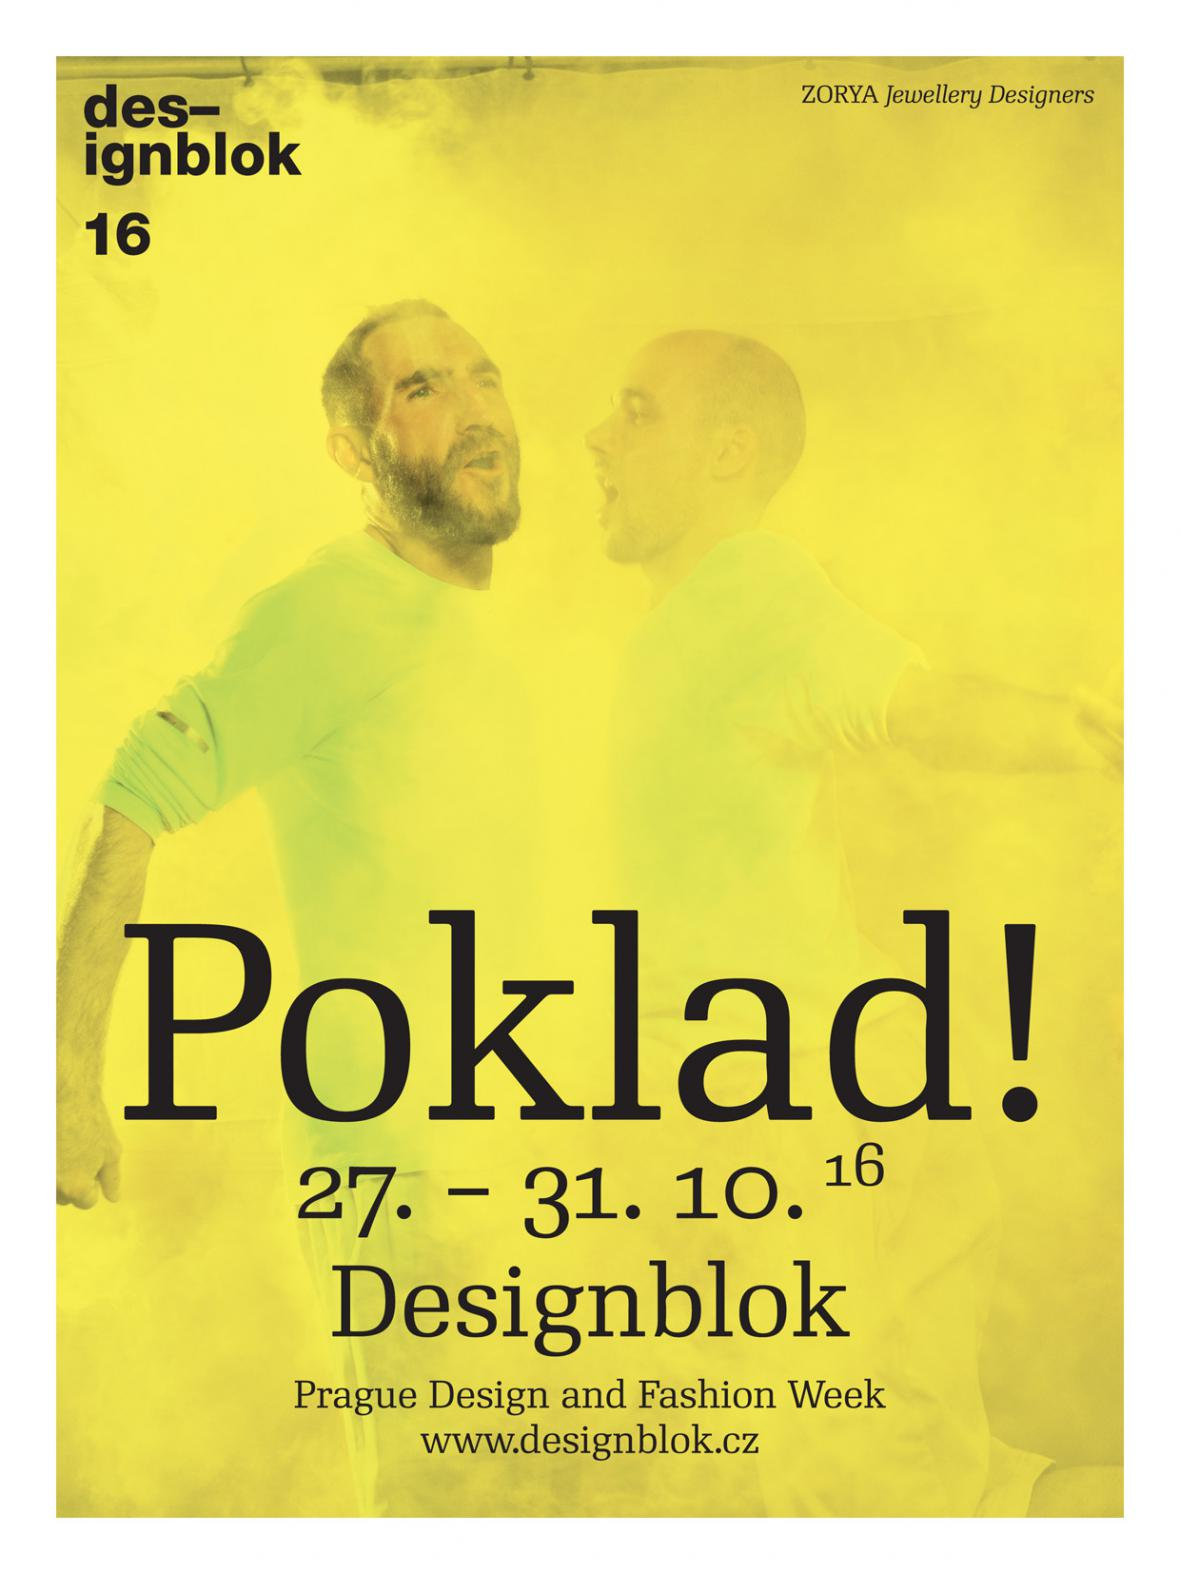 Designblok / ZORYA